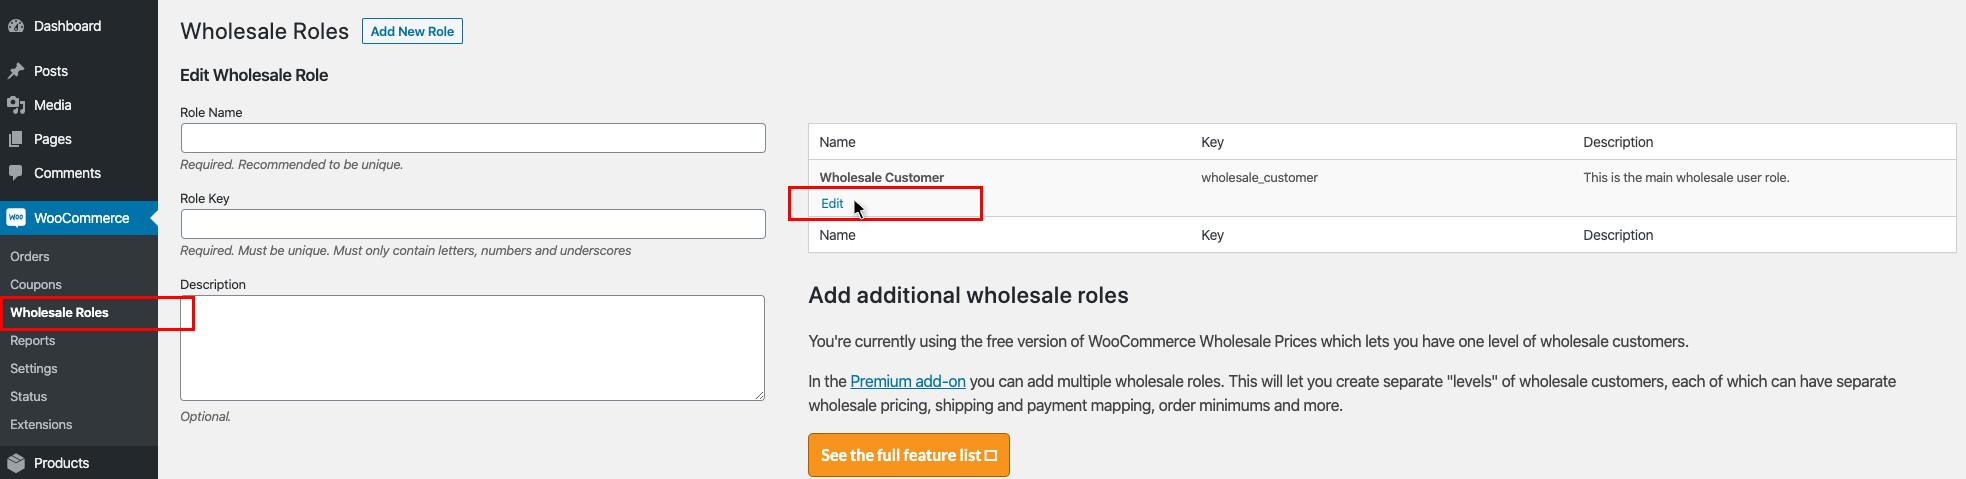 WooCommerce Wholesale Roles